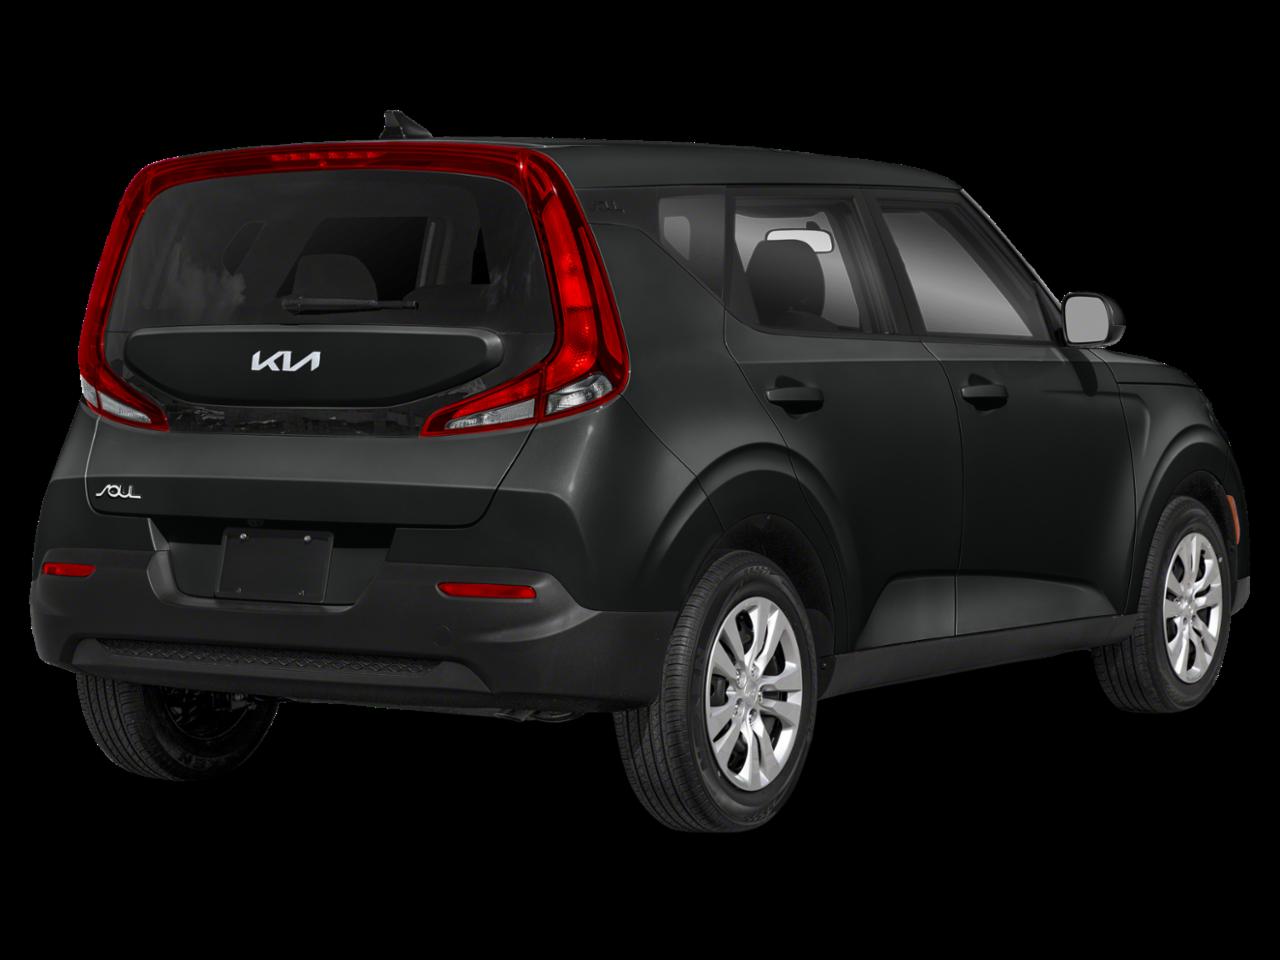 2022 Kia Soul Hatchback